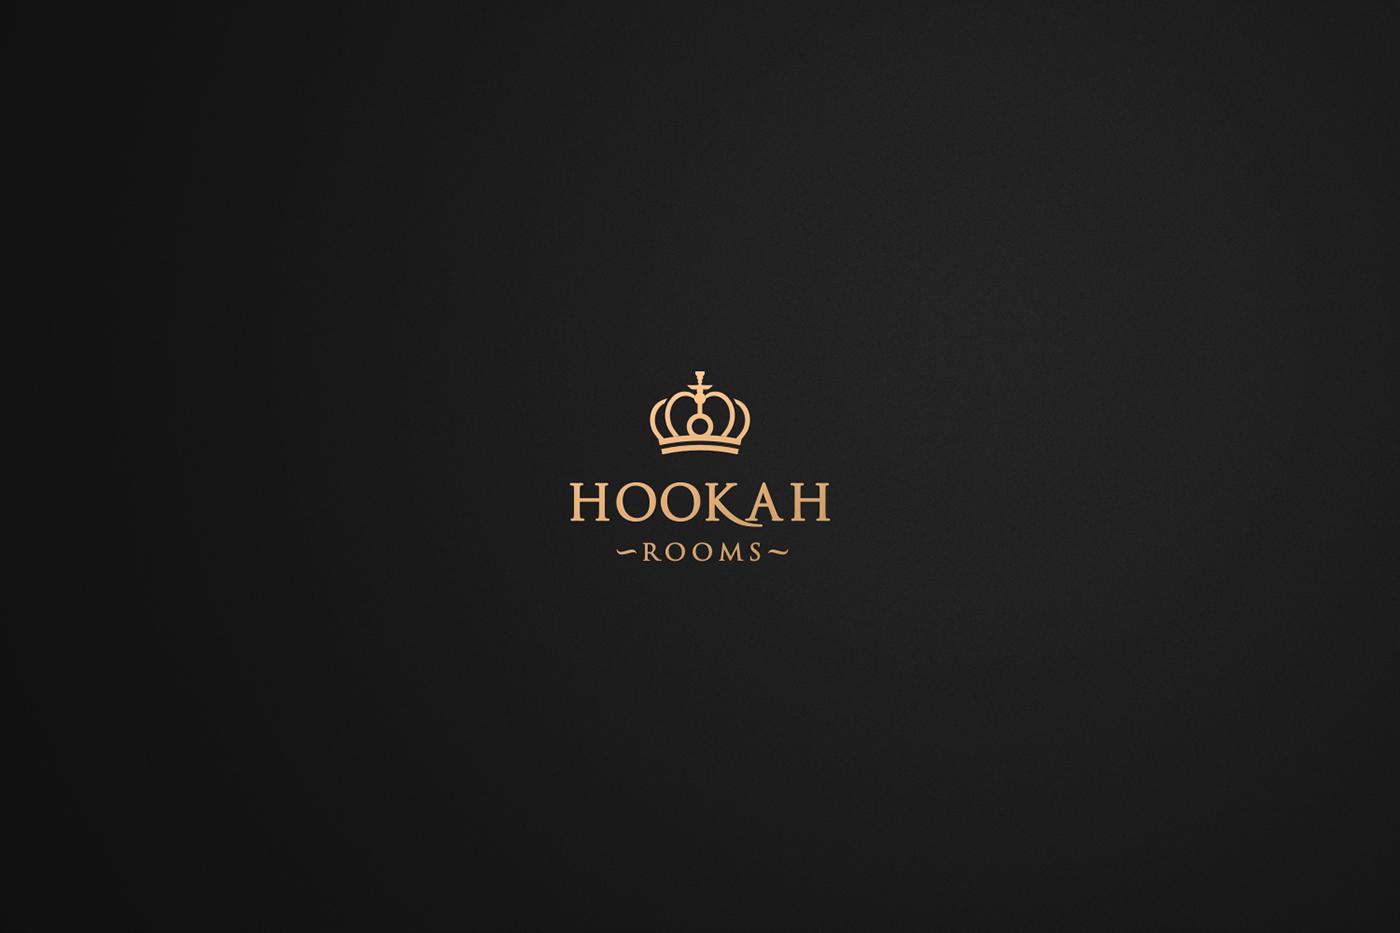 Hookah Rooms On Behance Tabacaria Ideias